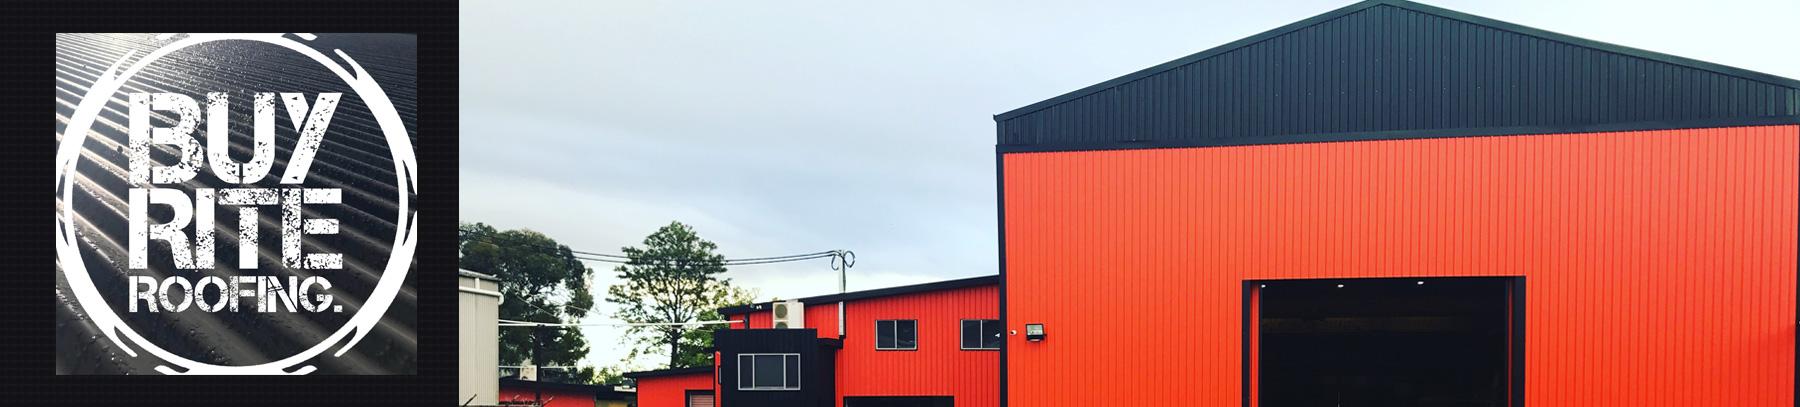 Buy Rite Roofing Newcastle Lake Macquarie Logo